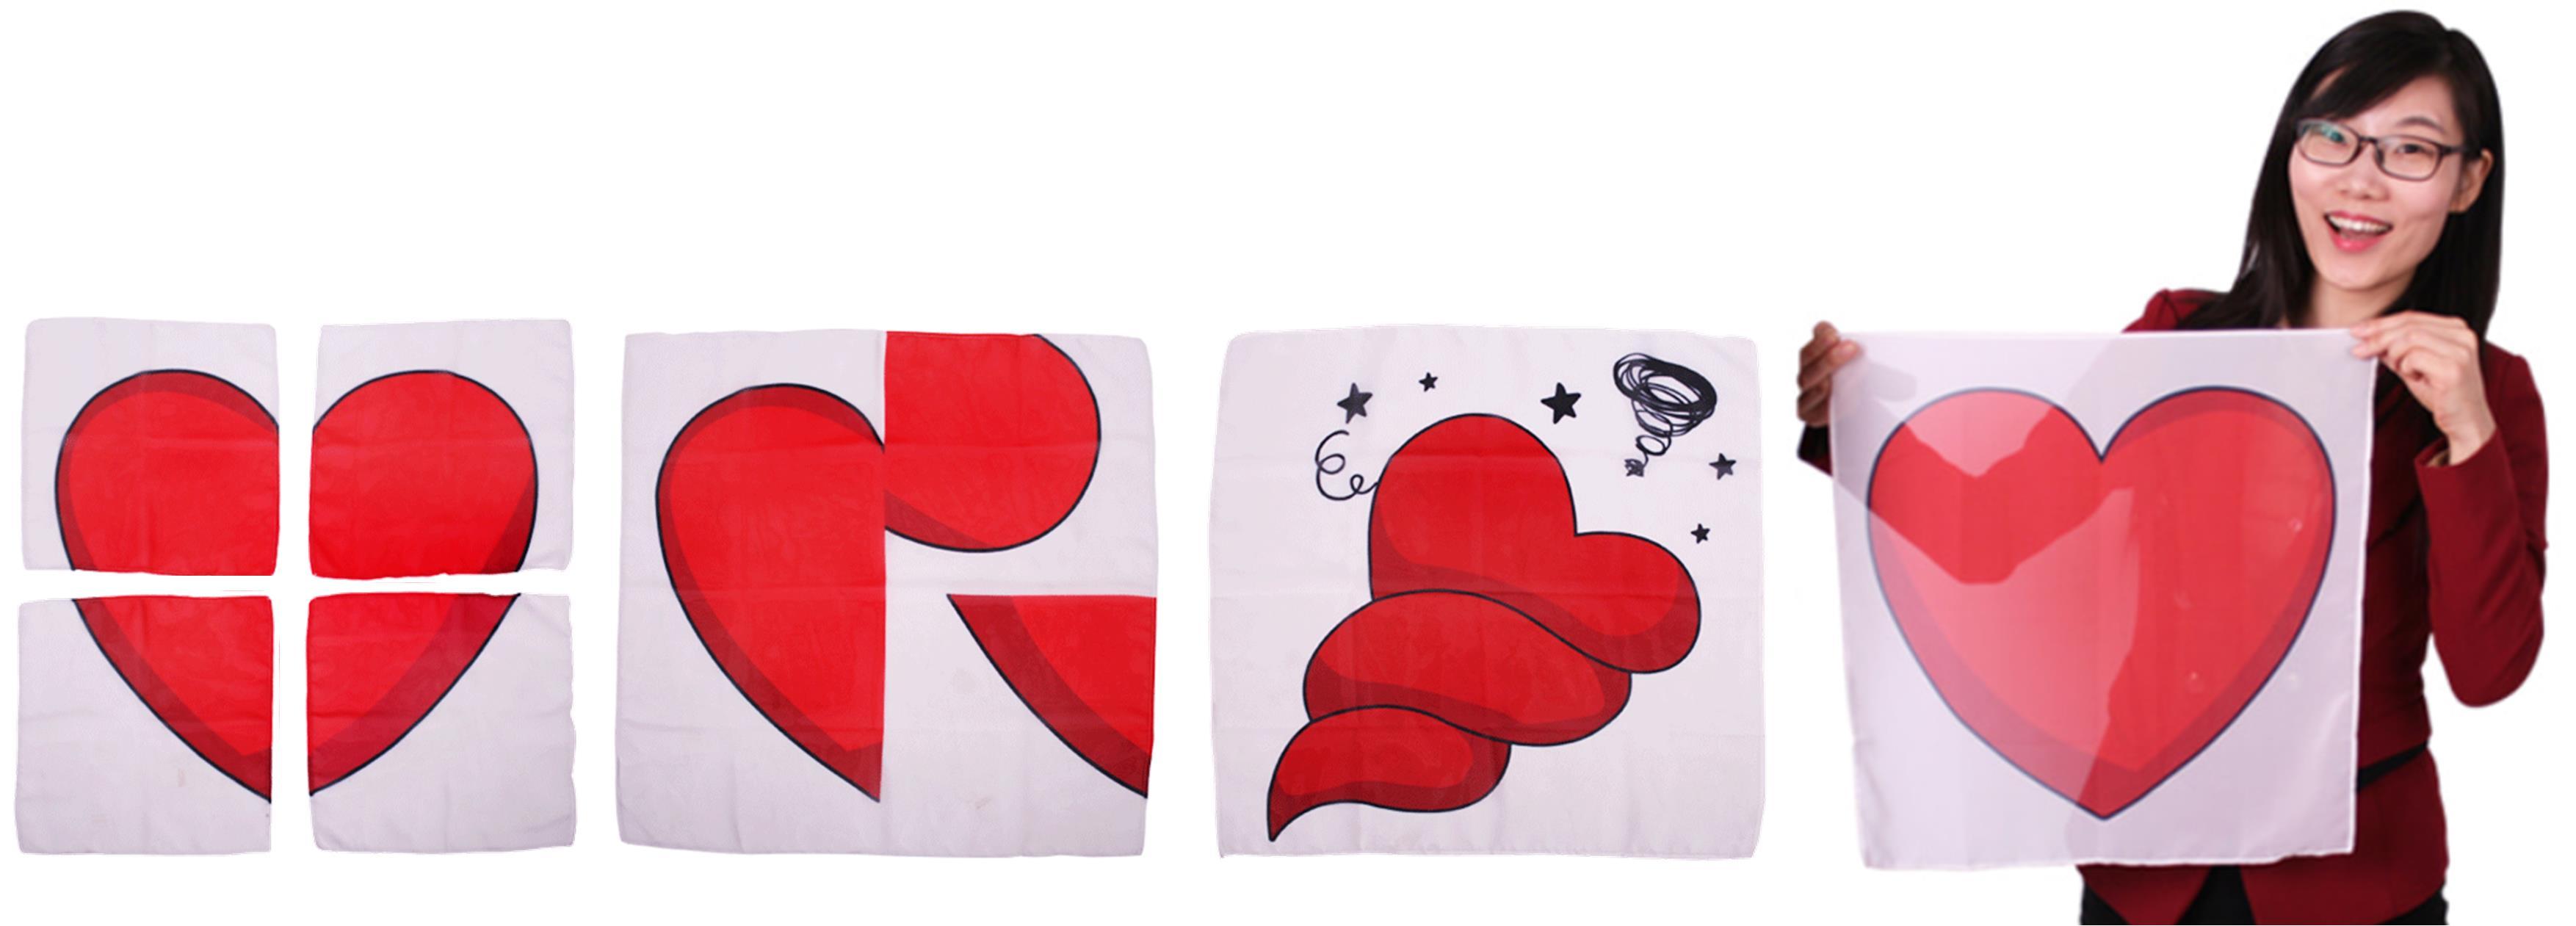 comic-heart-silk-set-magic-trick-gospel-2.jpg